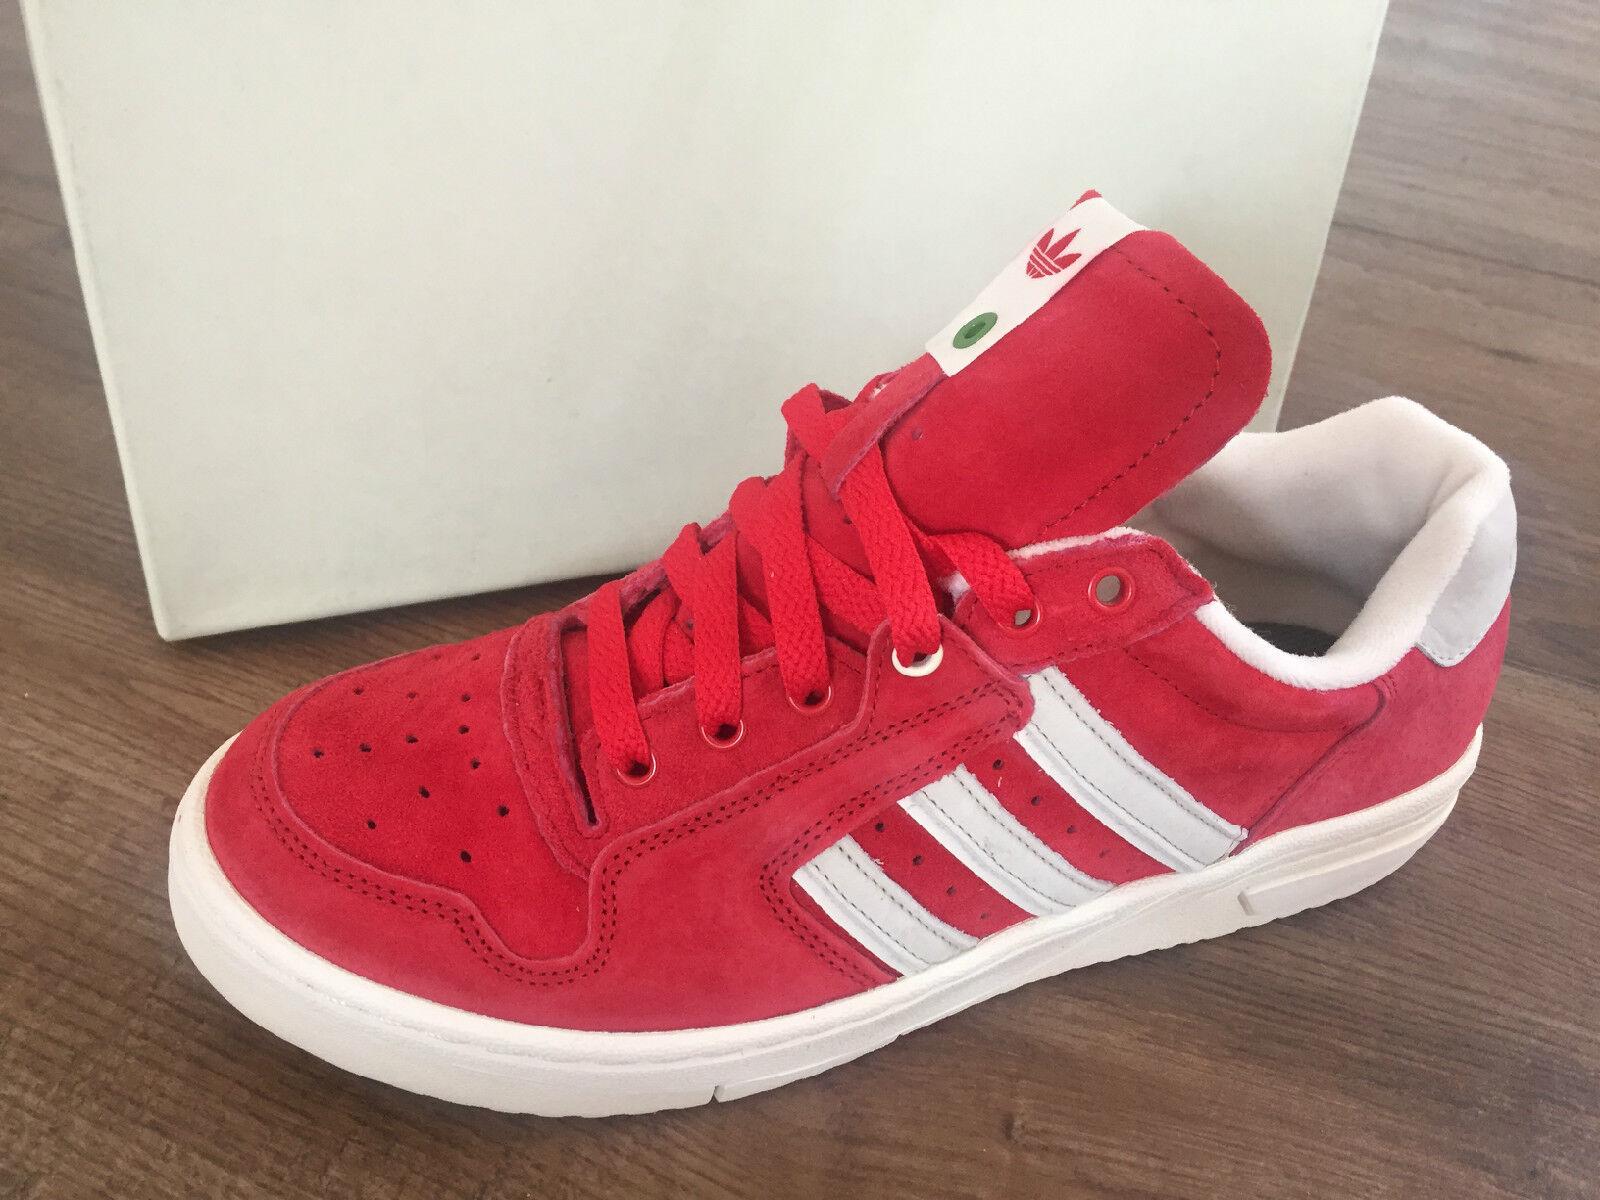 ADIDAS Edberg 86 Footpatrol Schuhe B35022 ORIGINALS B35022 Schuhe d0b2d7